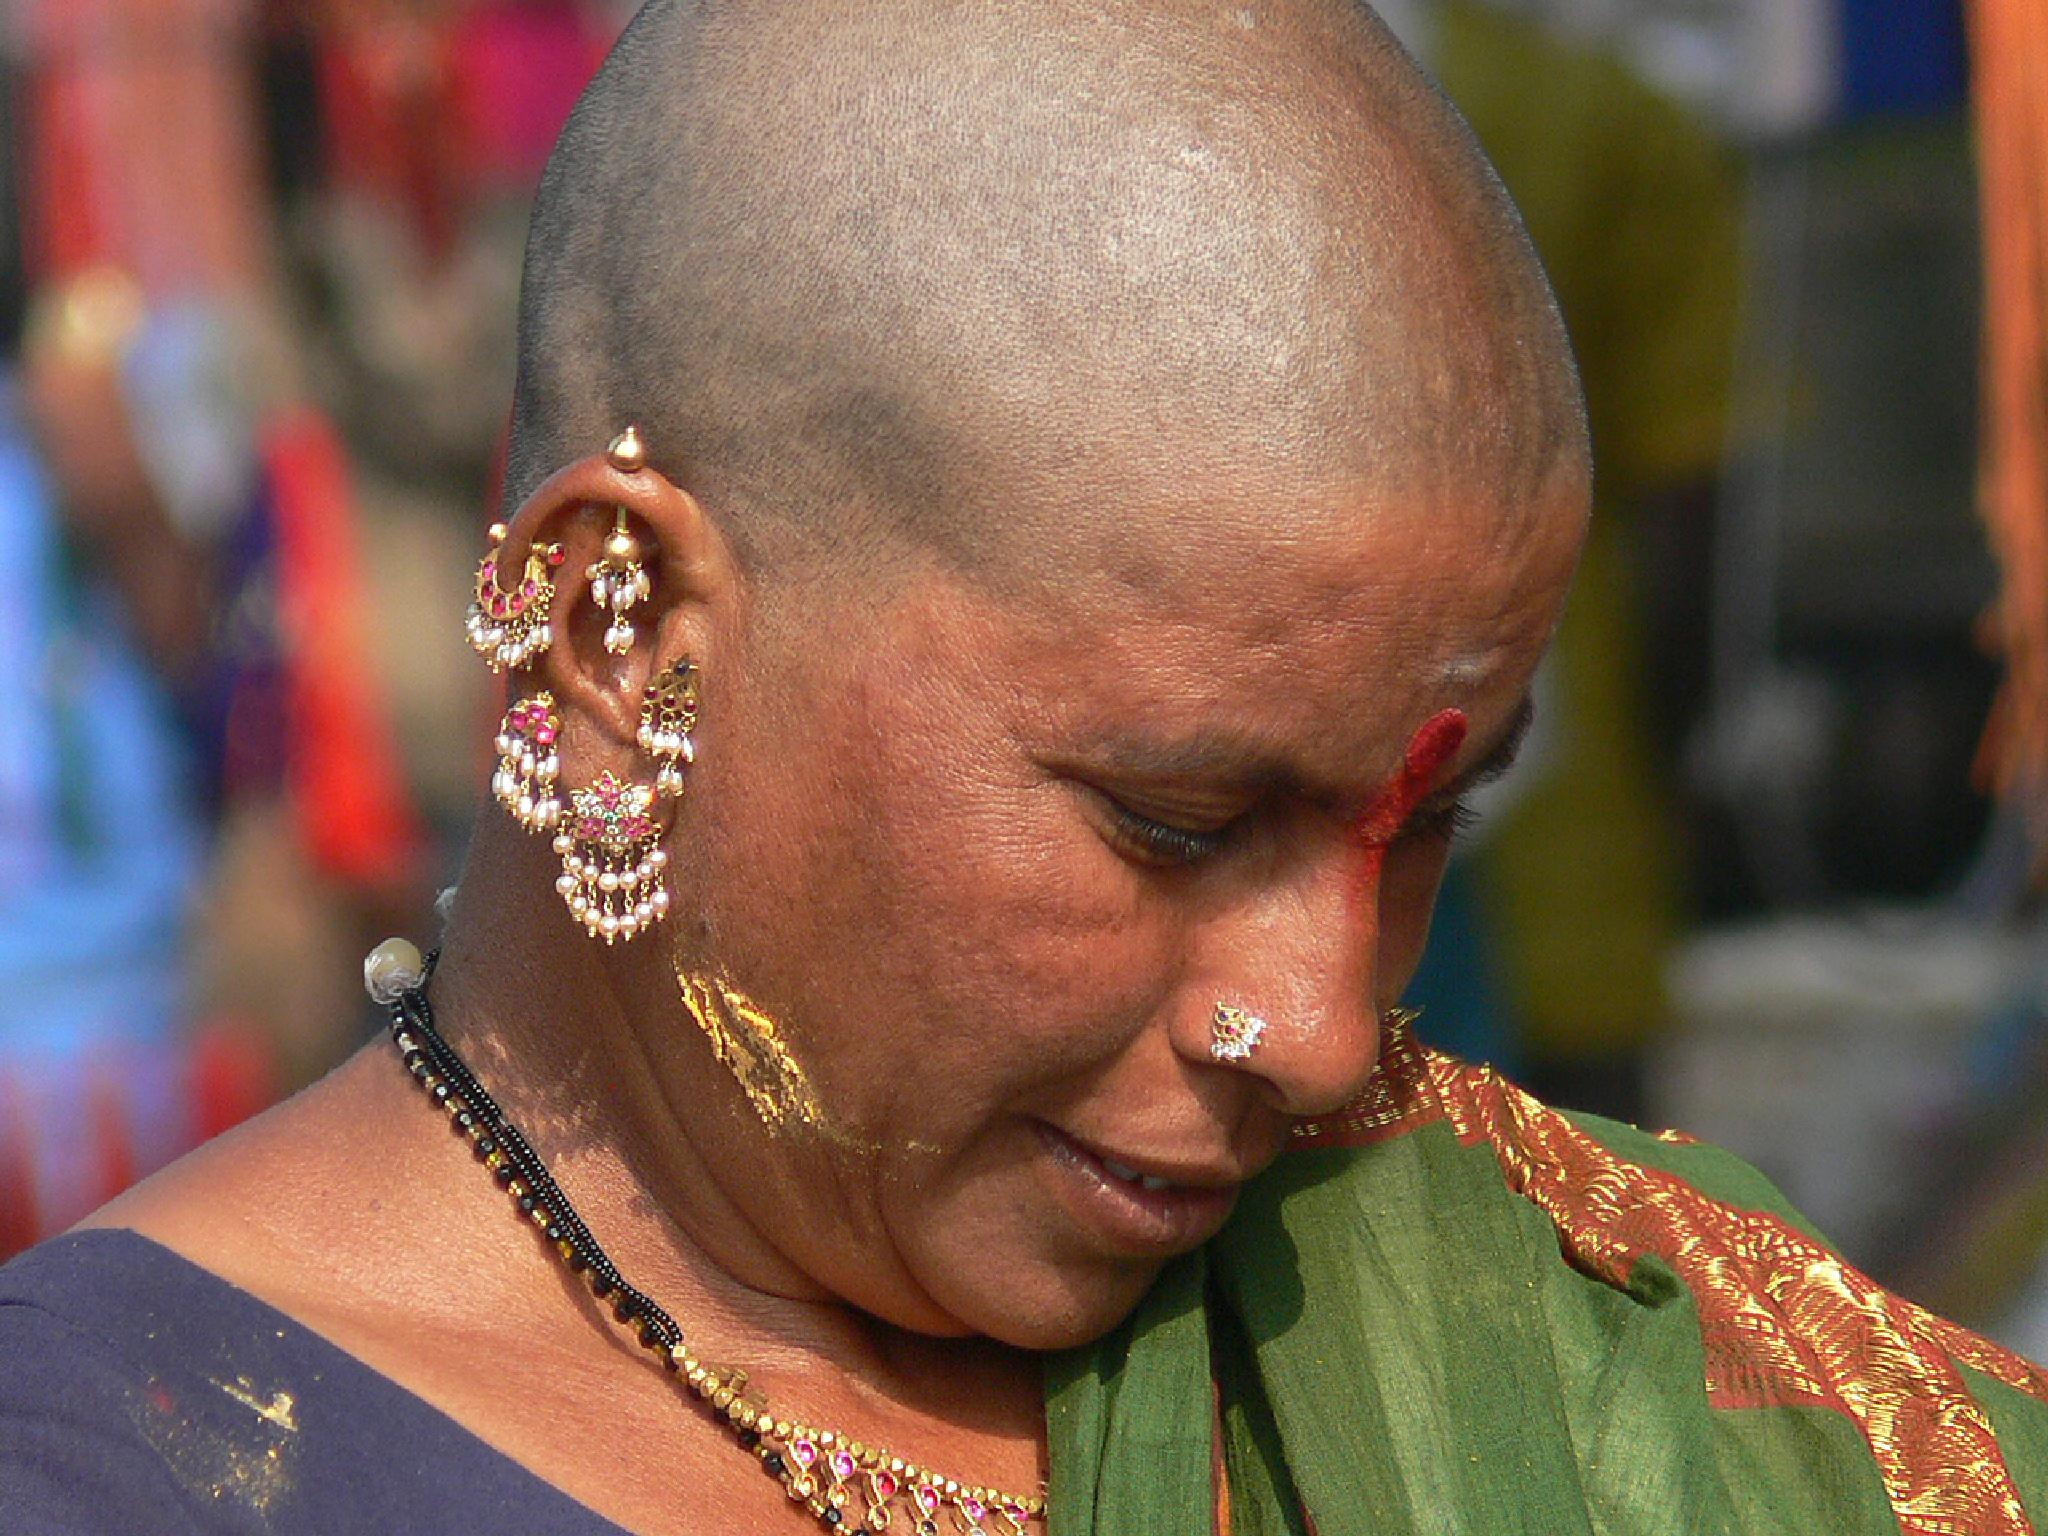 Tirupati head shave.  by Rauf